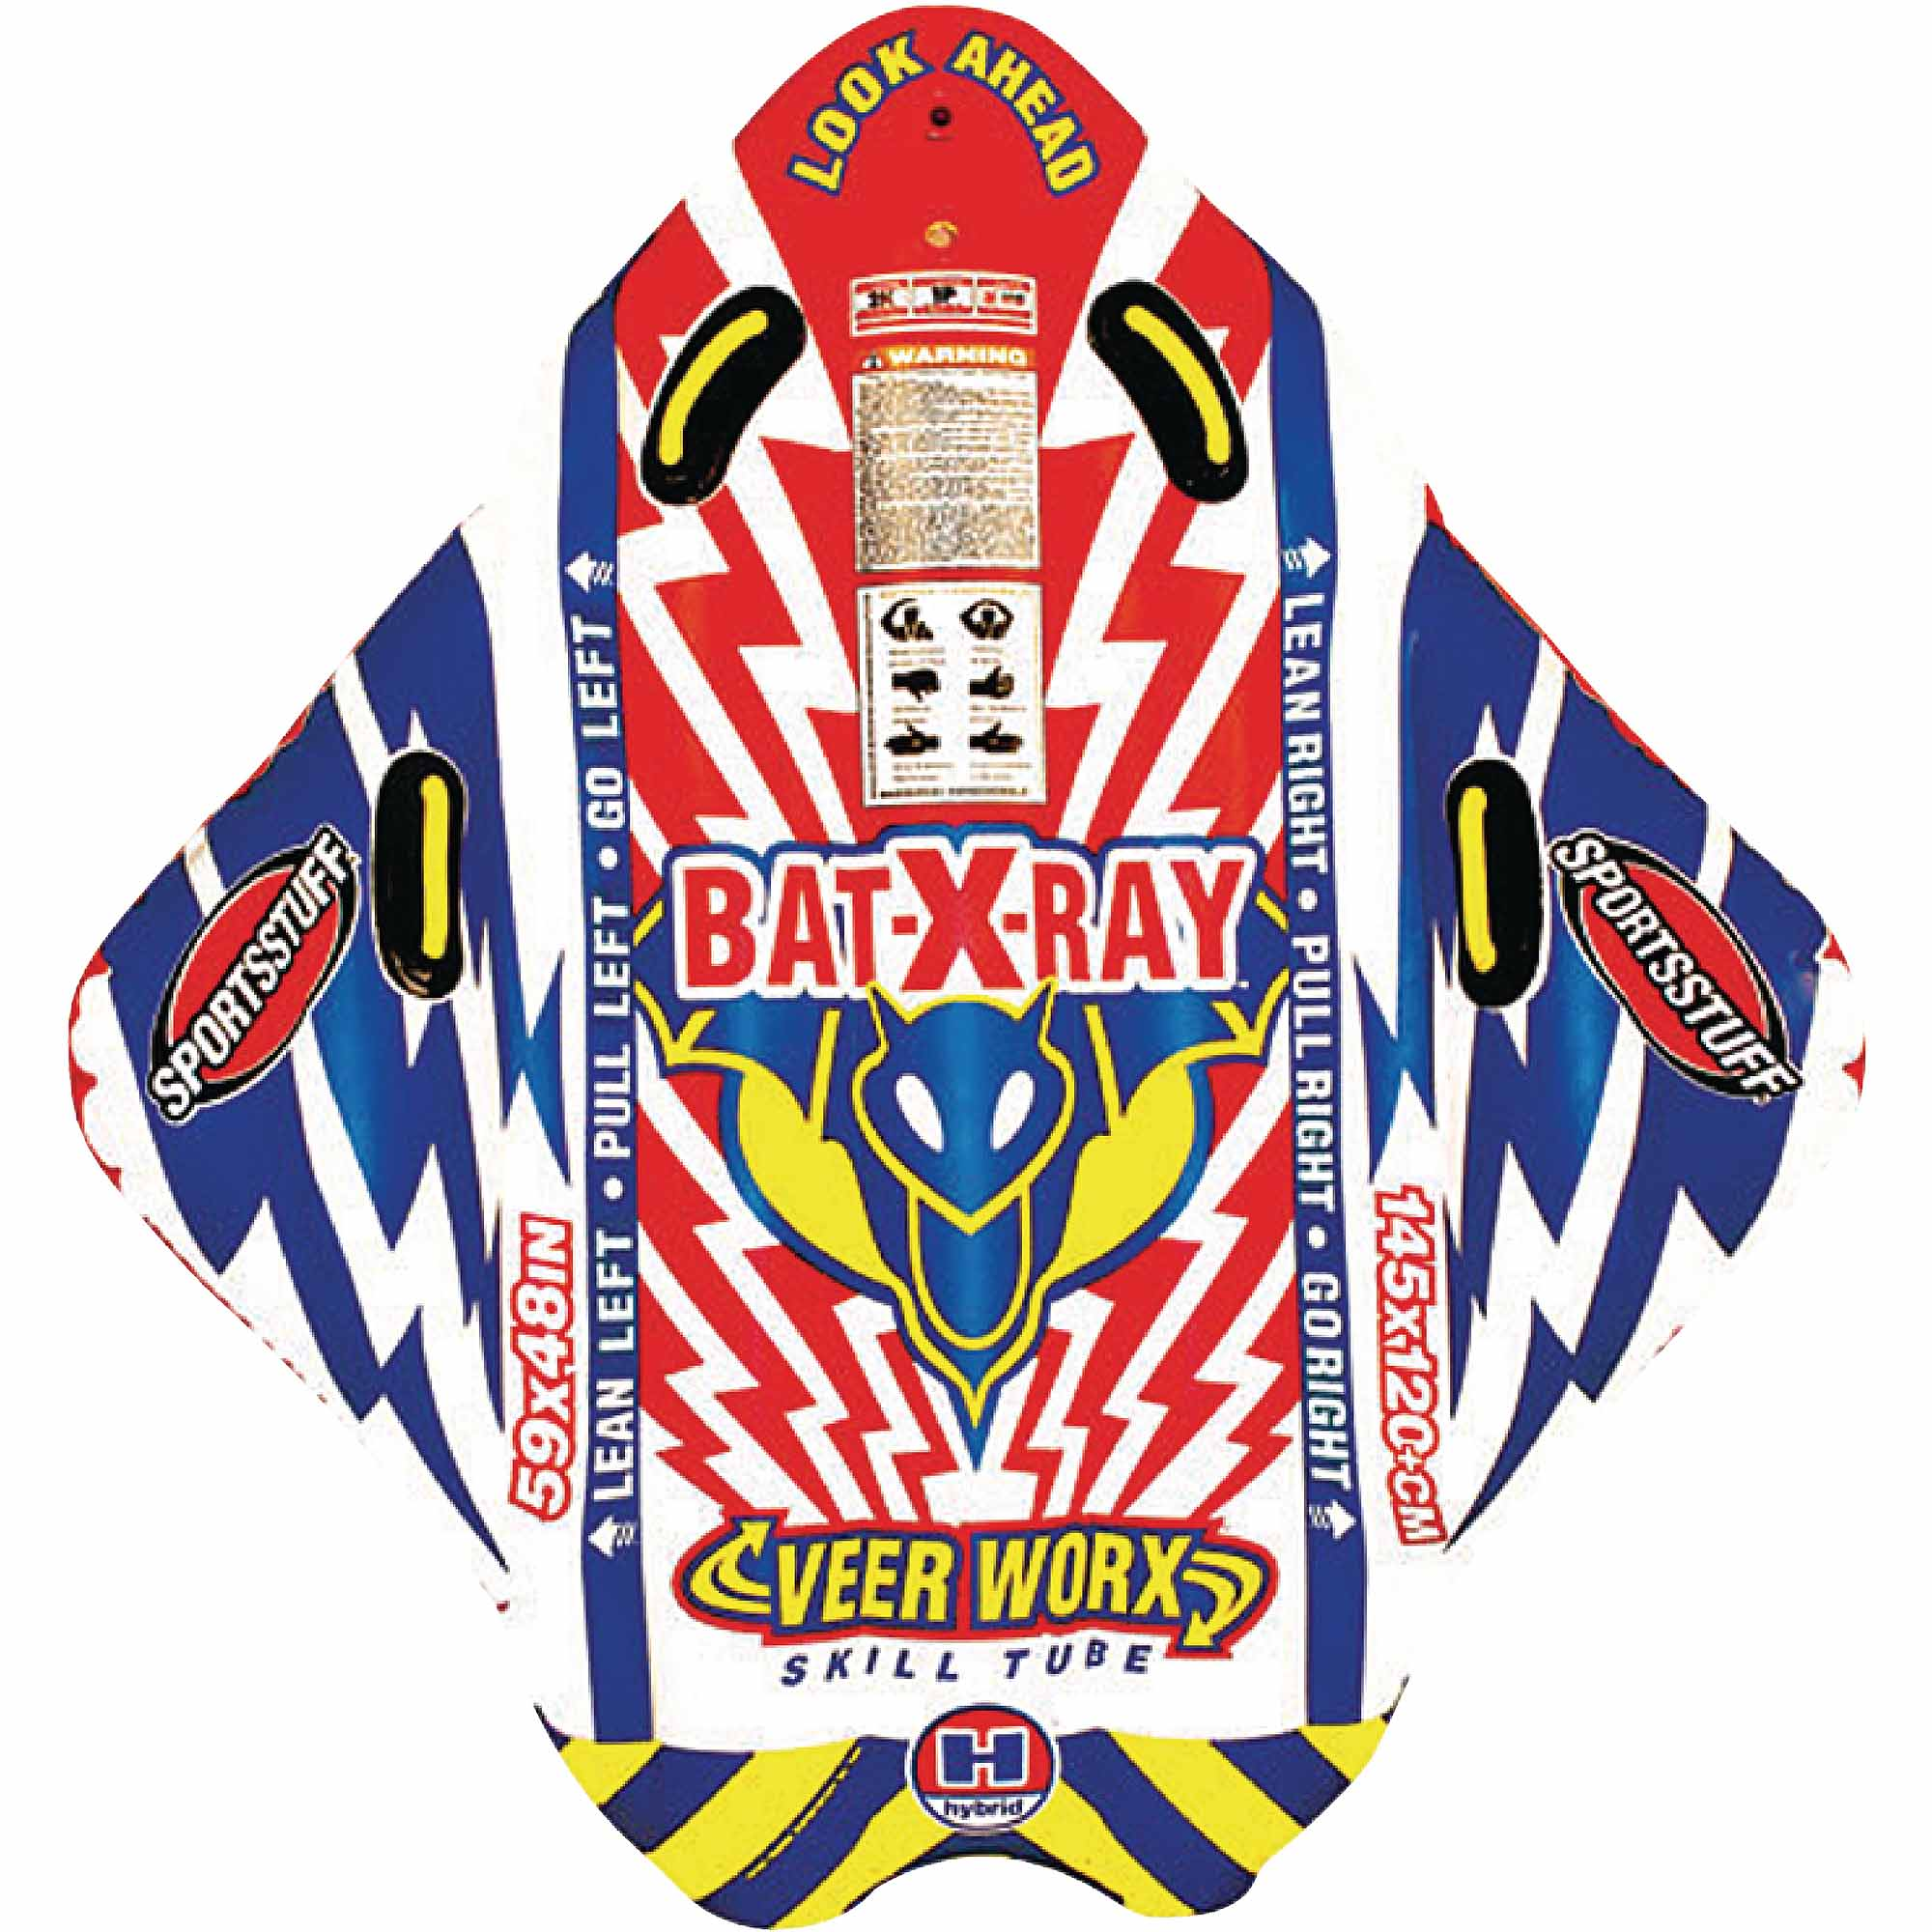 Sportsstuff Bat-X-Ray Towable Single Rider Tube by Kwik Tek